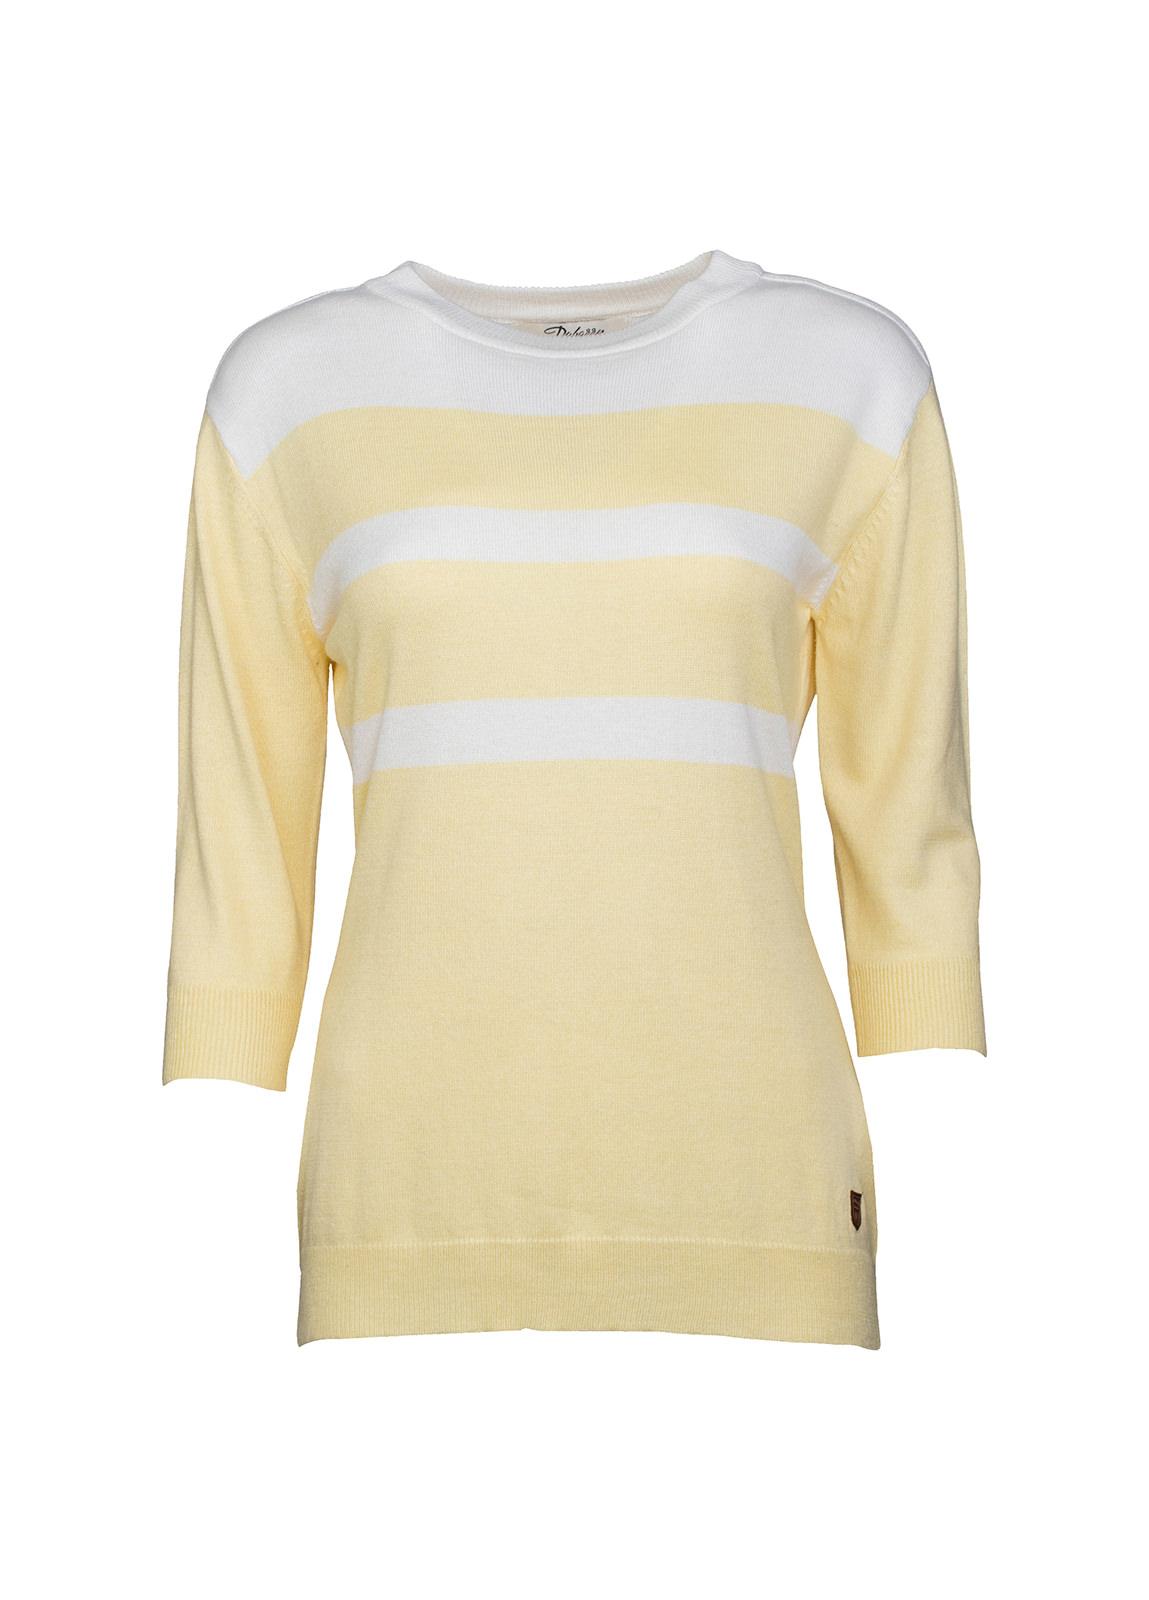 Dubarry_Morrison Ladies Sweater - Royal Blue_Image_2